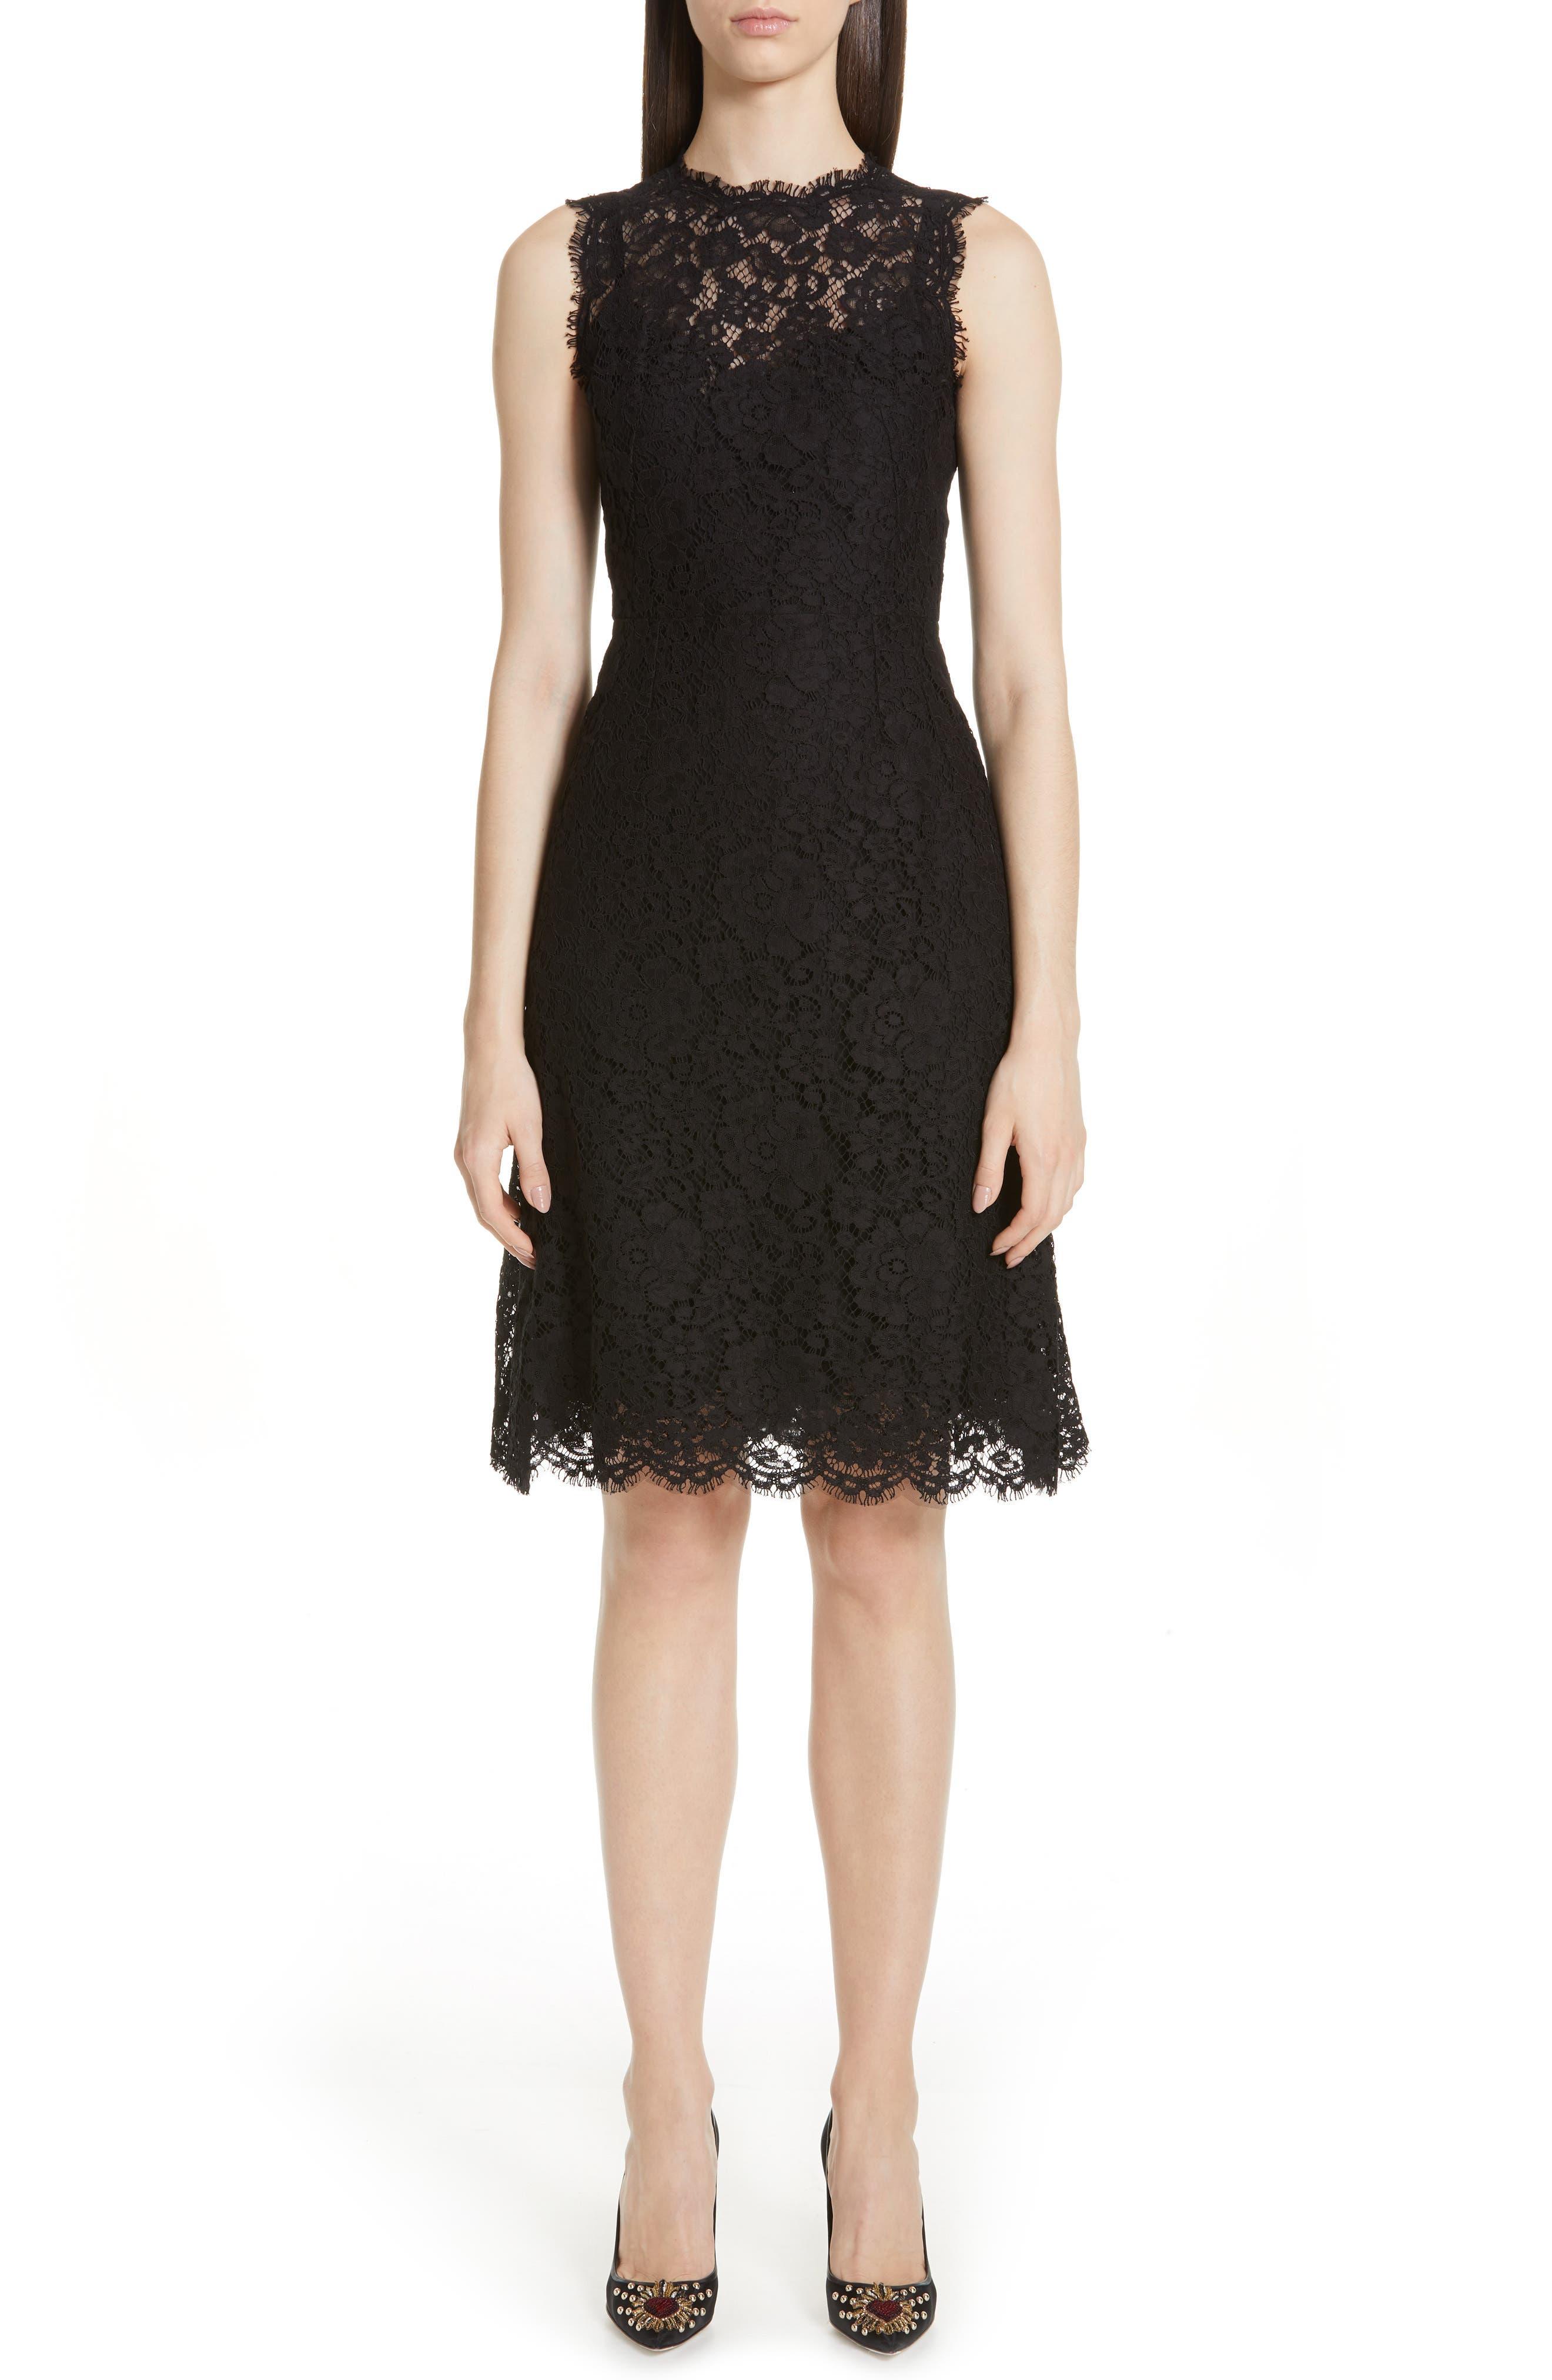 Dolce & gabbana Lace A-Line Dress, US / 48 IT - Black